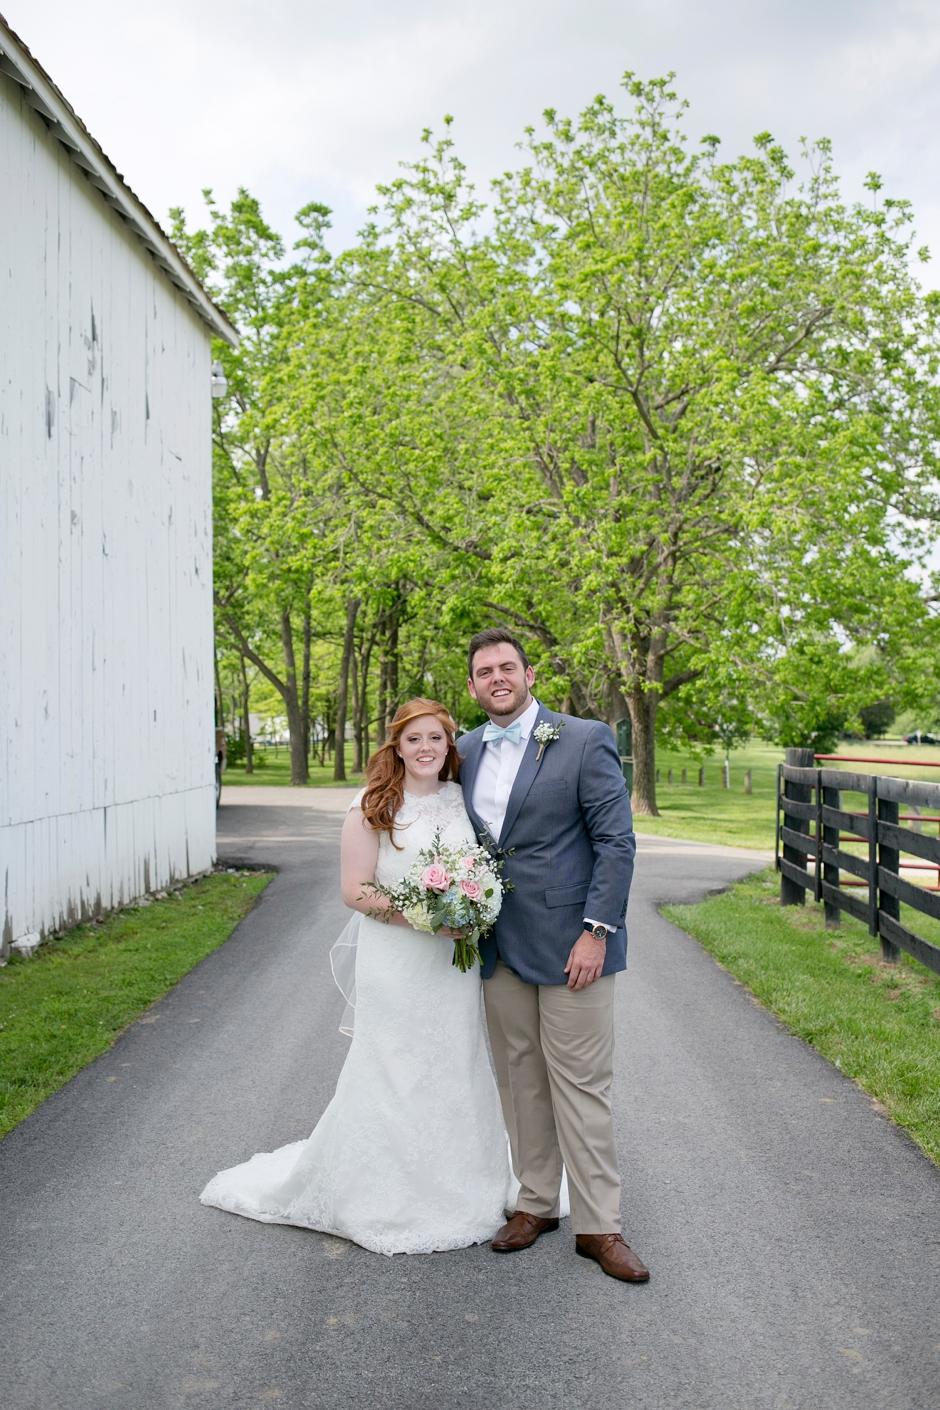 kentucky-spring-wedding-red-orchard-park-blush-555